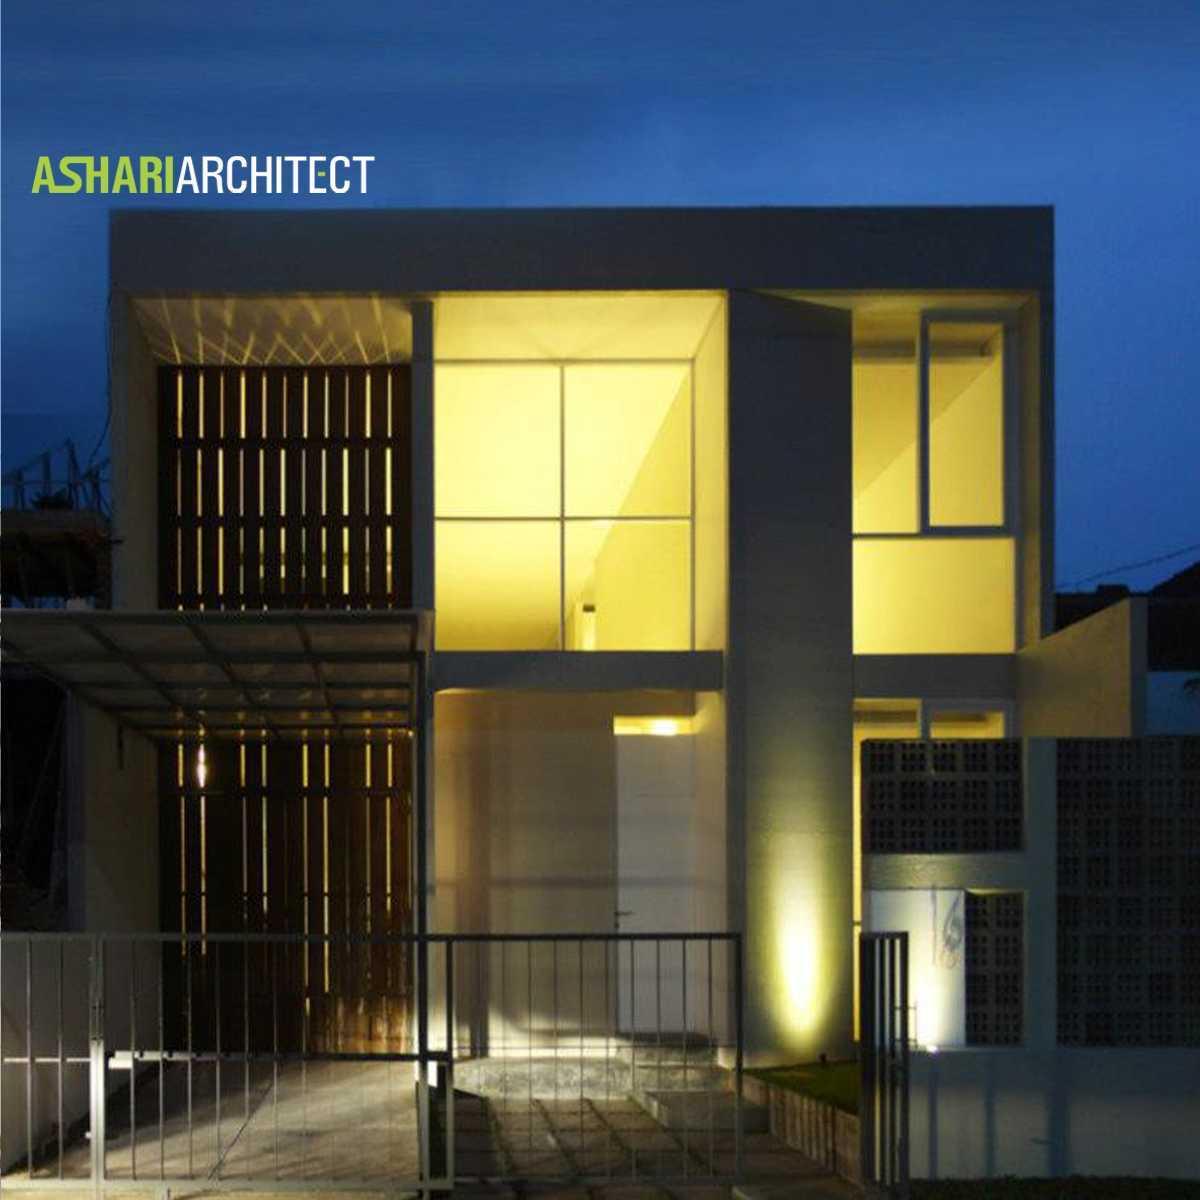 Ashari Architects Salendro House Bandung, Indonesia Bandung, Indonesia Night-Front-View   11876